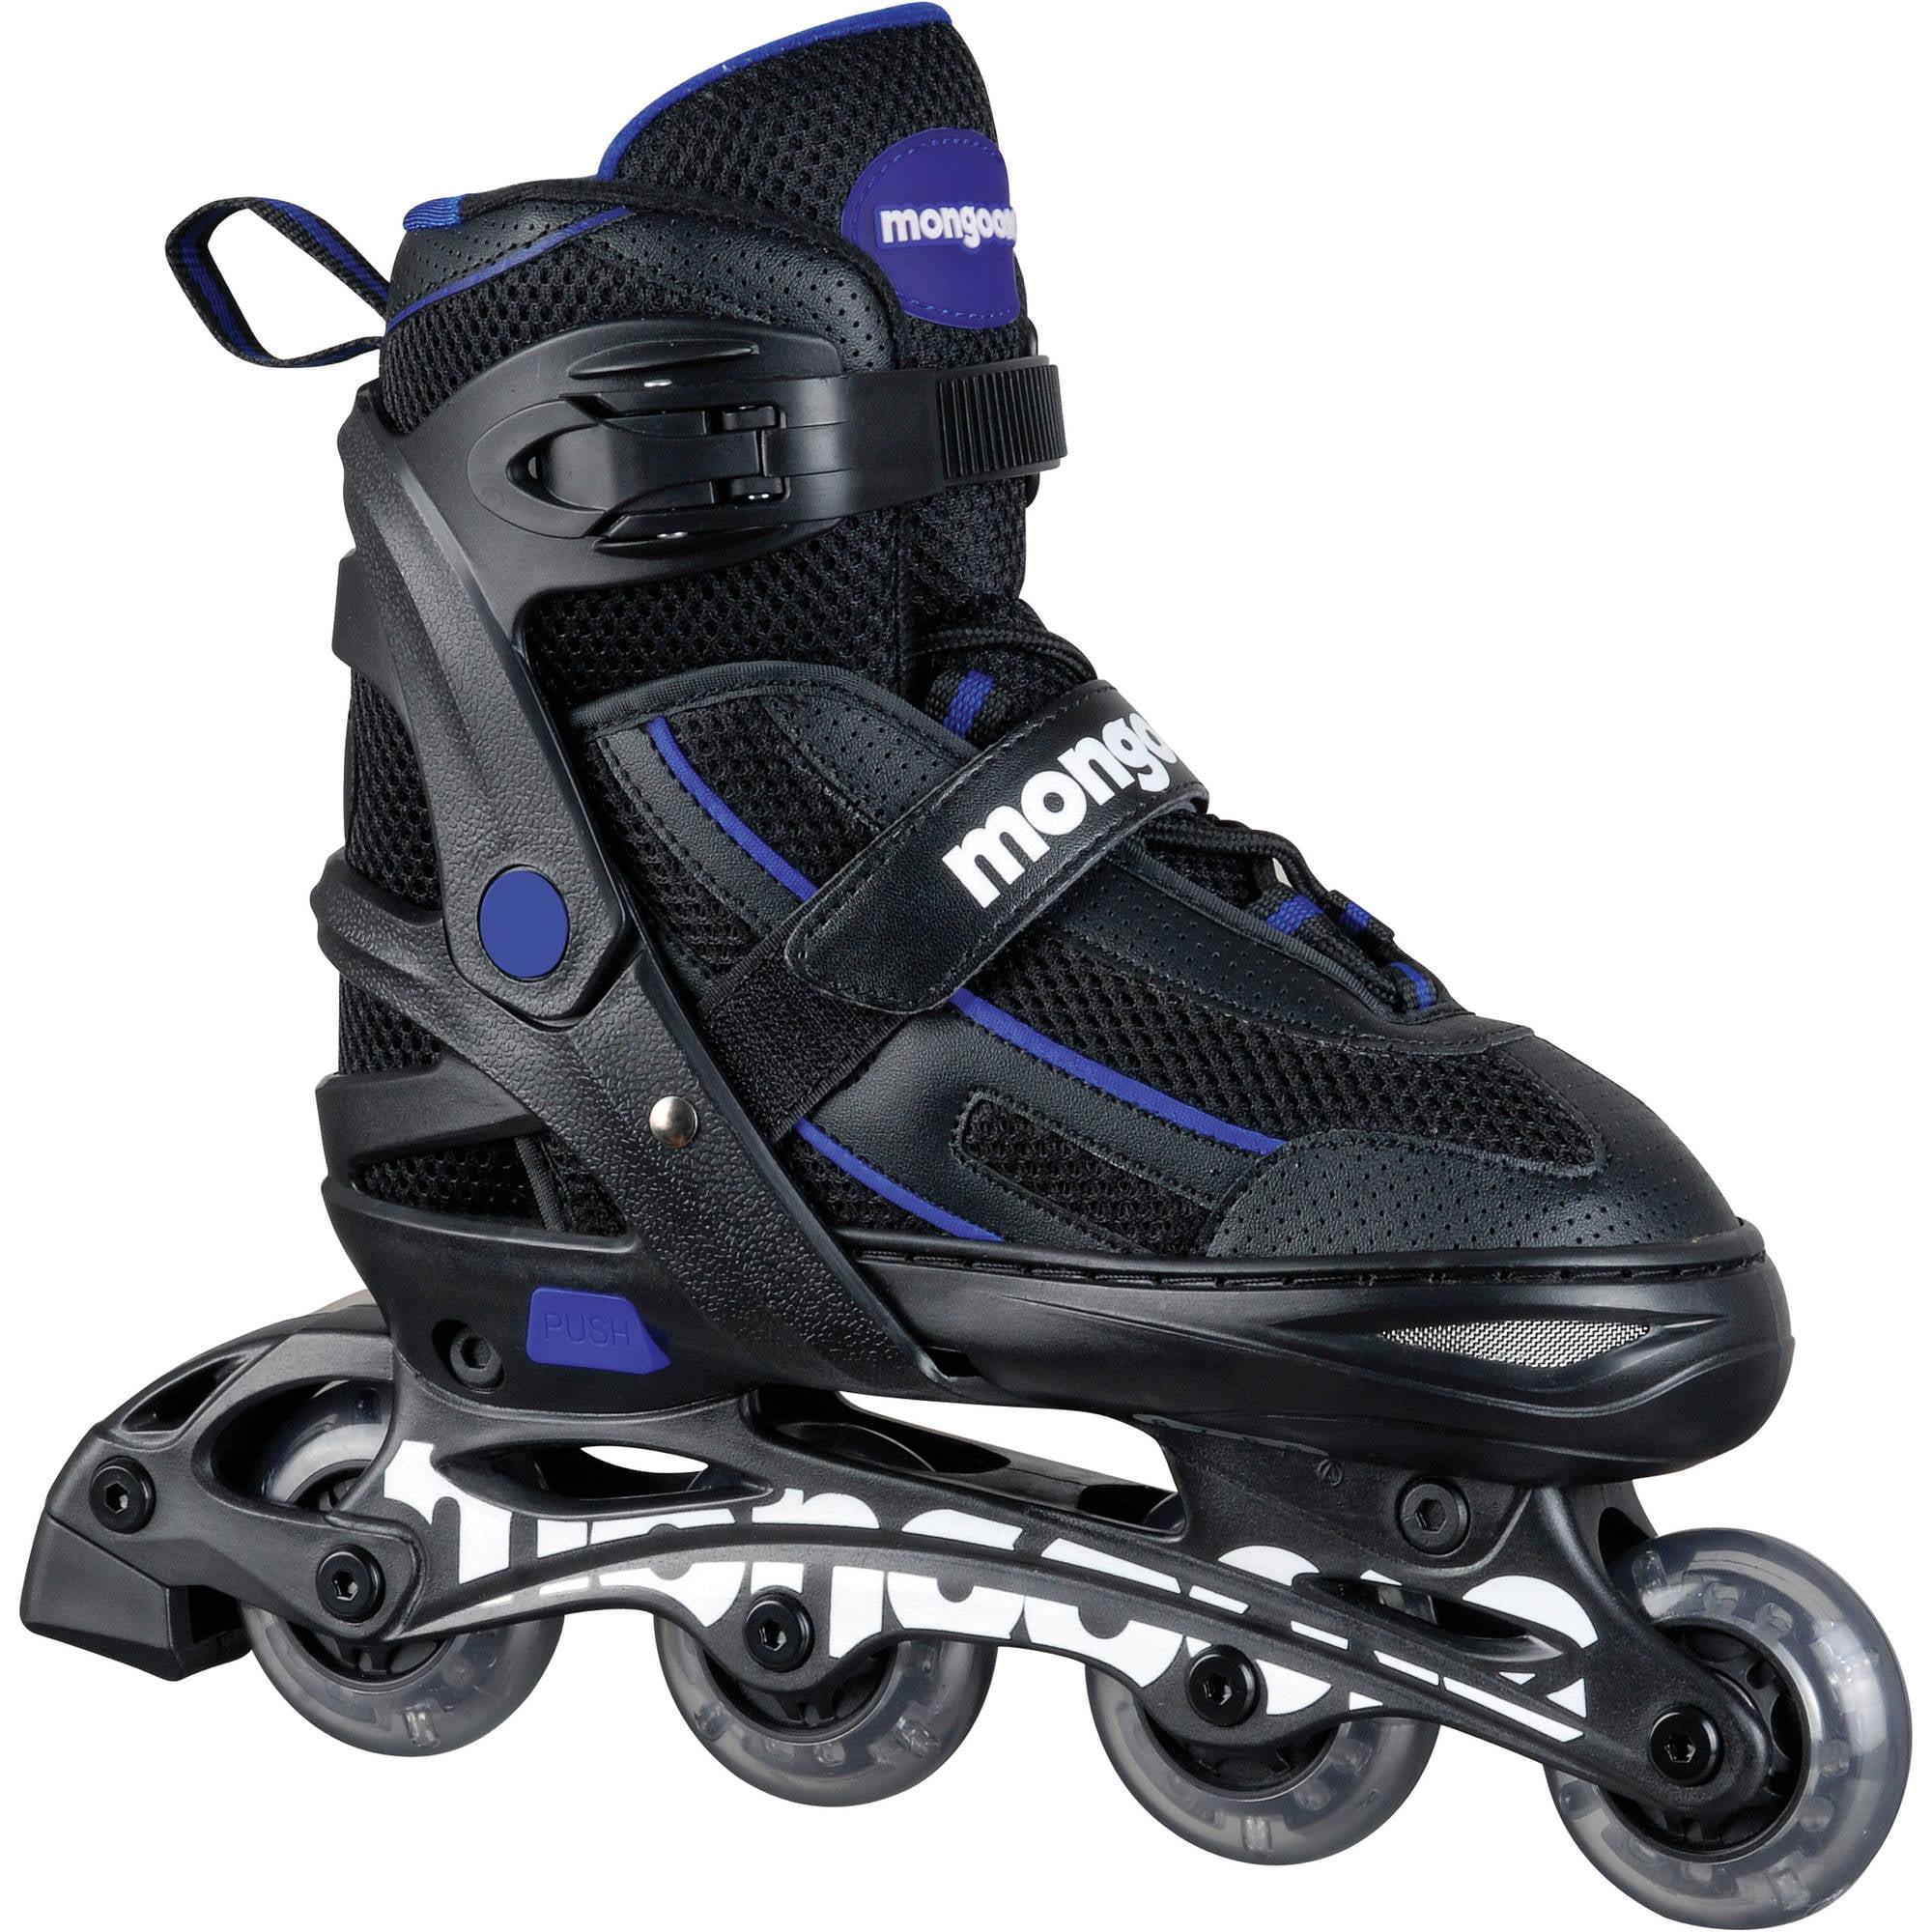 Roller skates light up - Roller Skates Light Up 51